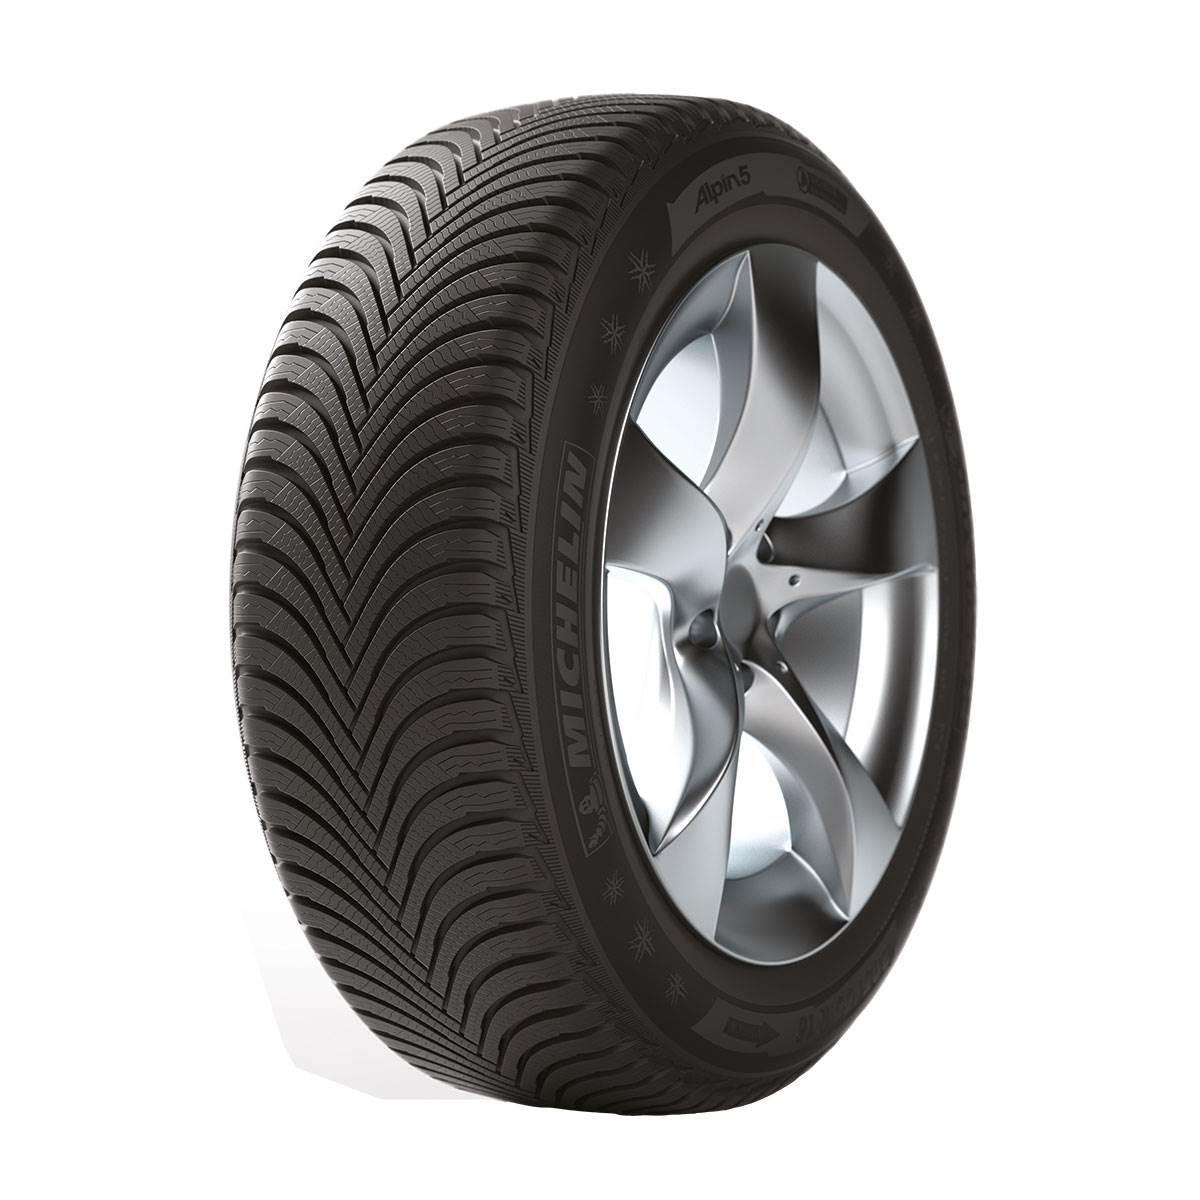 Pneu Hiver Michelin 195/65R15 91T Alpin A5